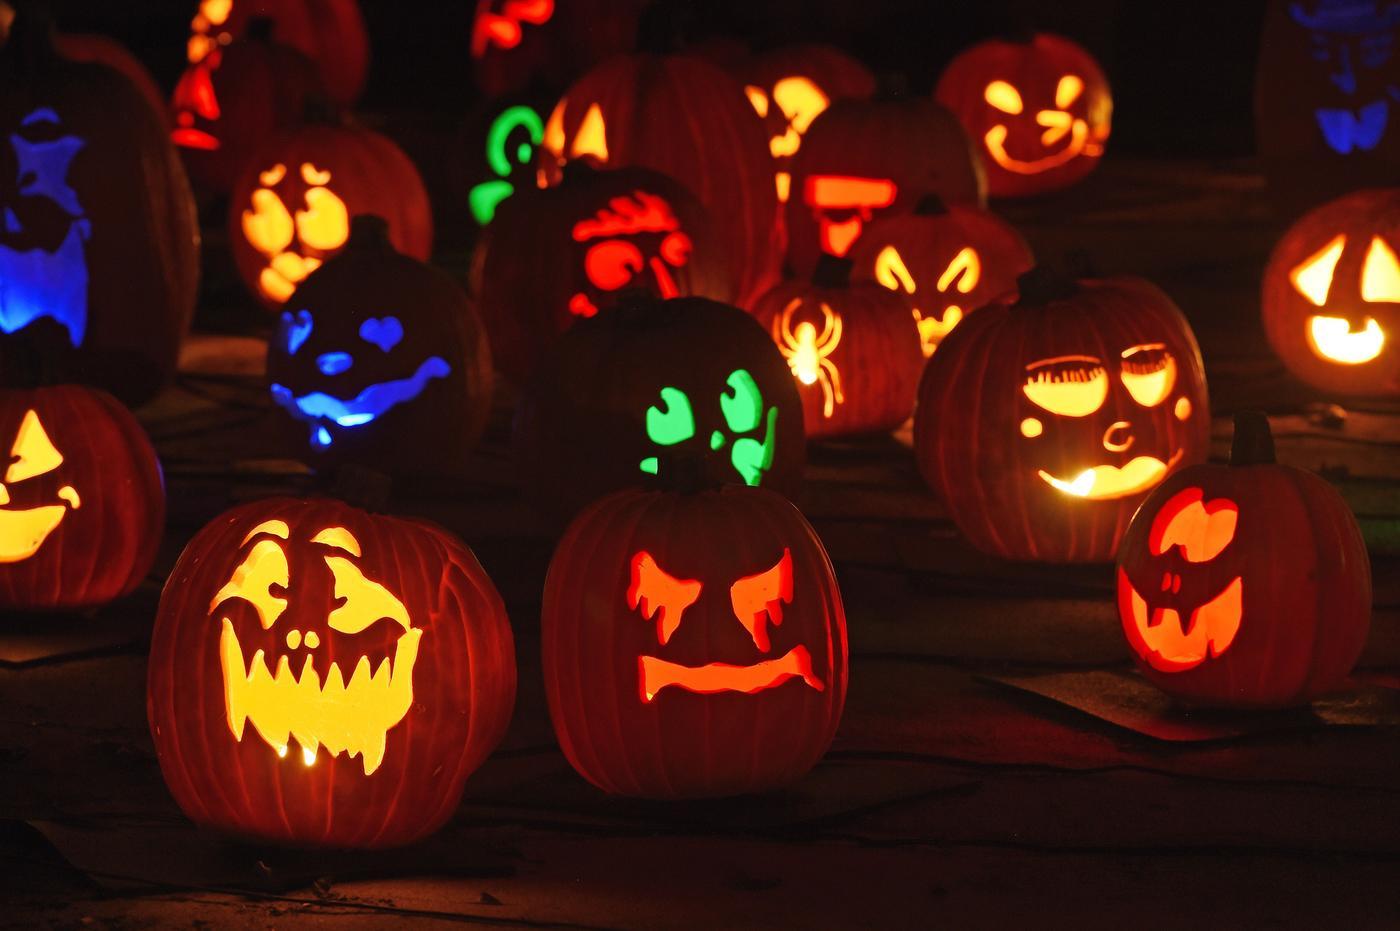 Halloween 2014: 13 Reasons To Hate Halloween | Metro News